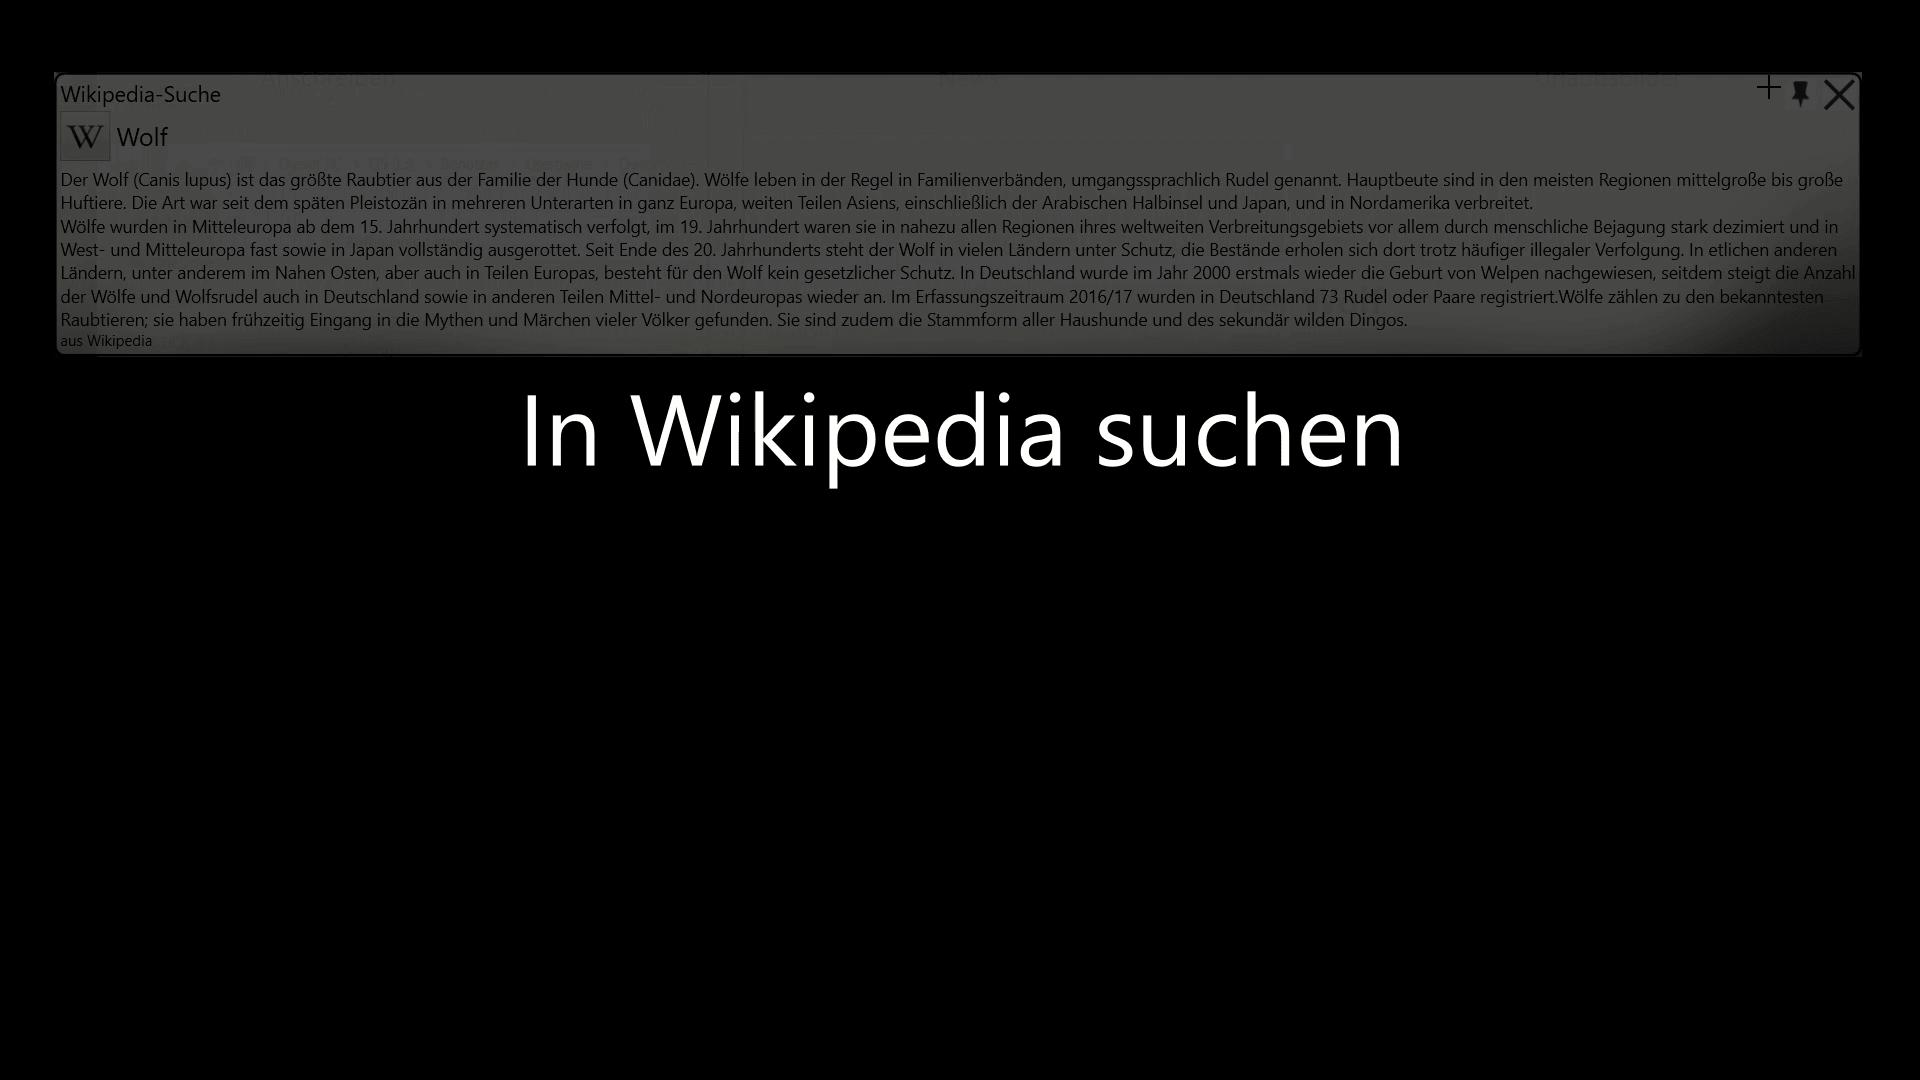 In Wikipedia suchen